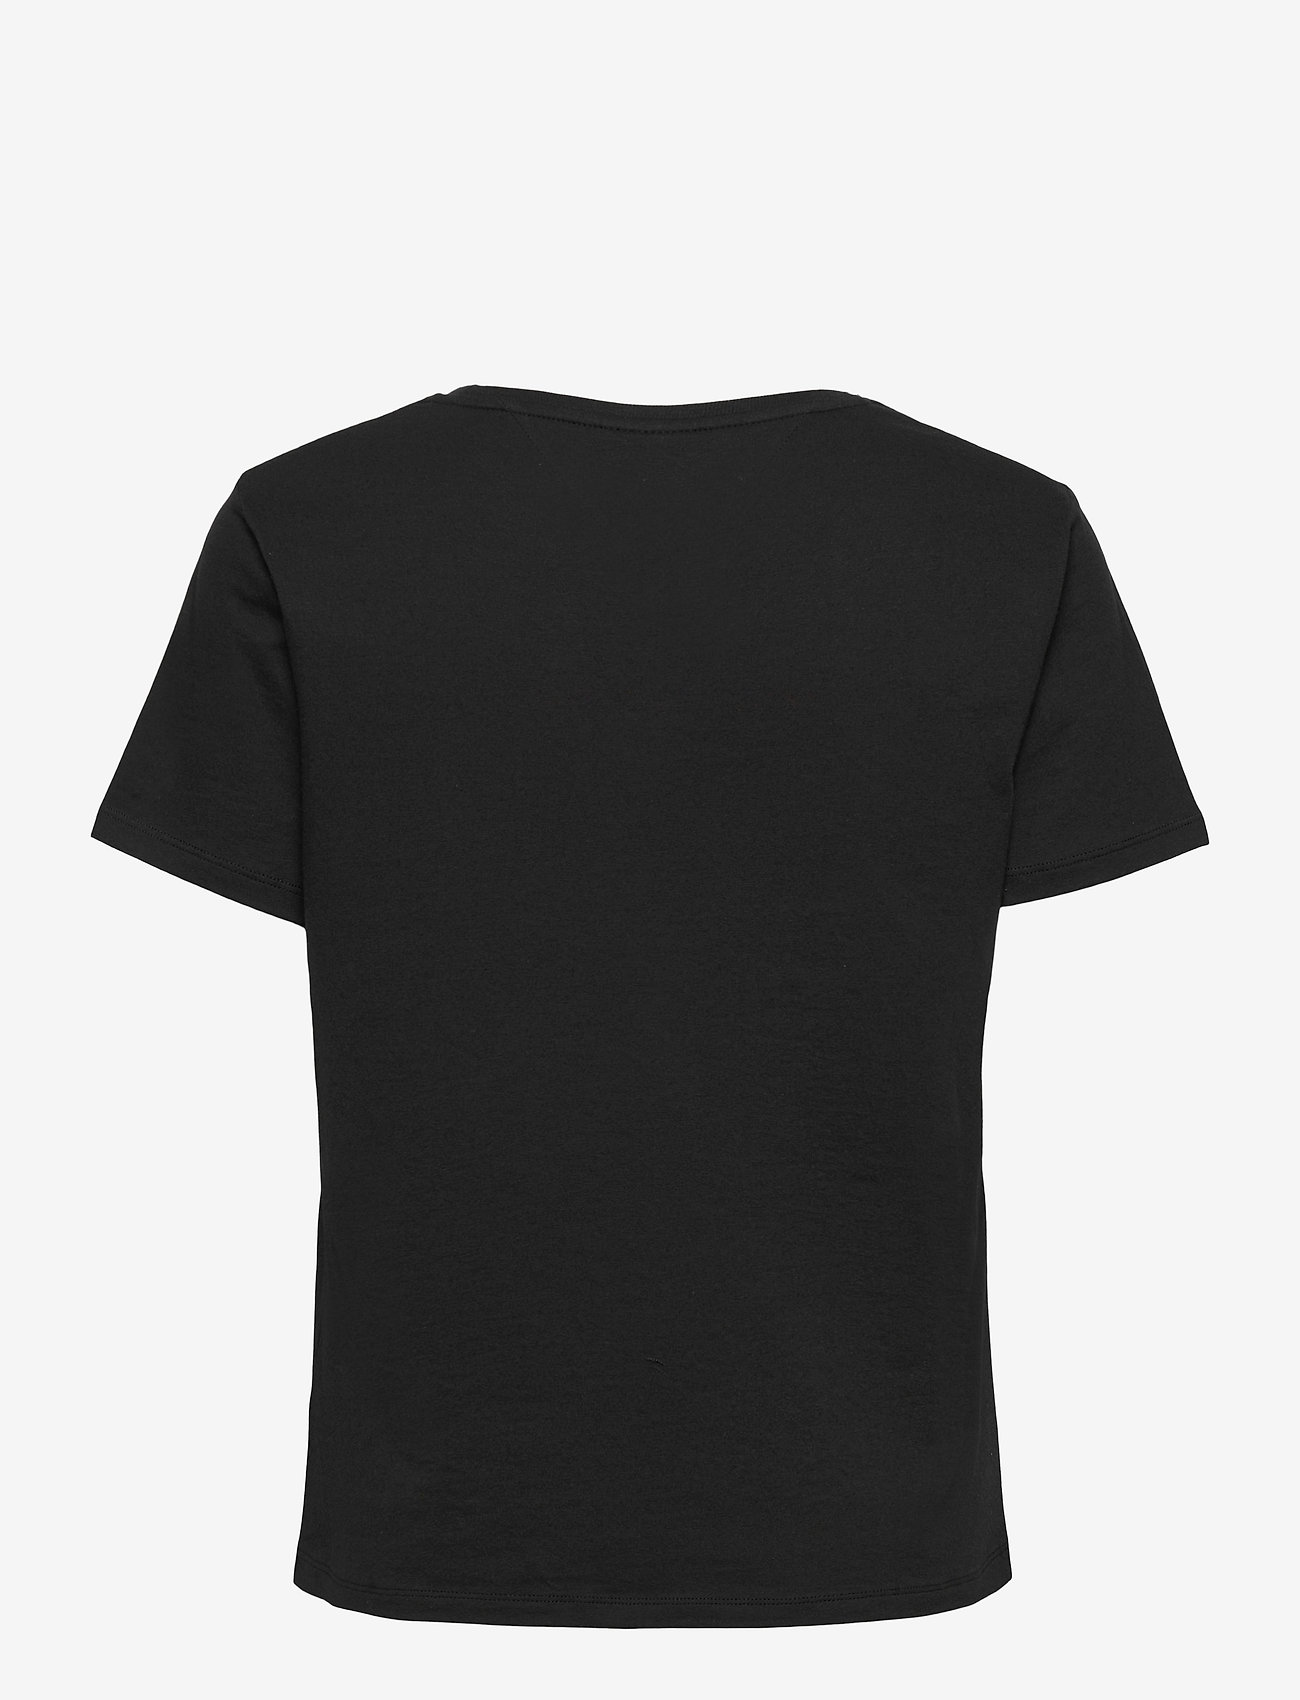 Tommy Jeans - TJW SLIM MULTI LINEAR LOGO - t-shirts - black - 1